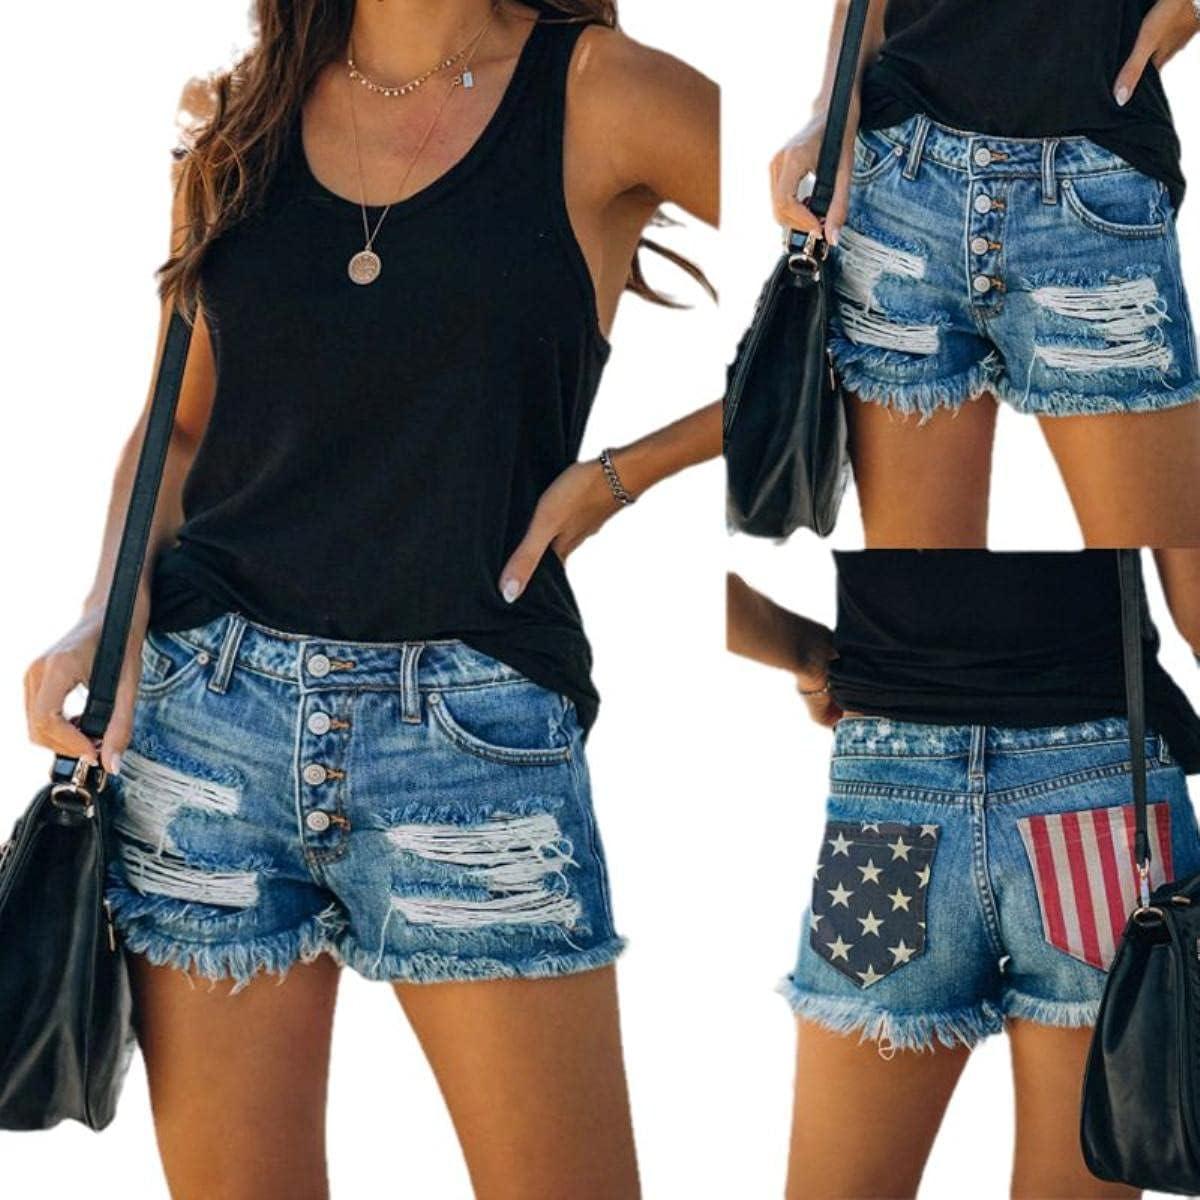 2021 Women's American Flag Printed Ripped Denim Shorts